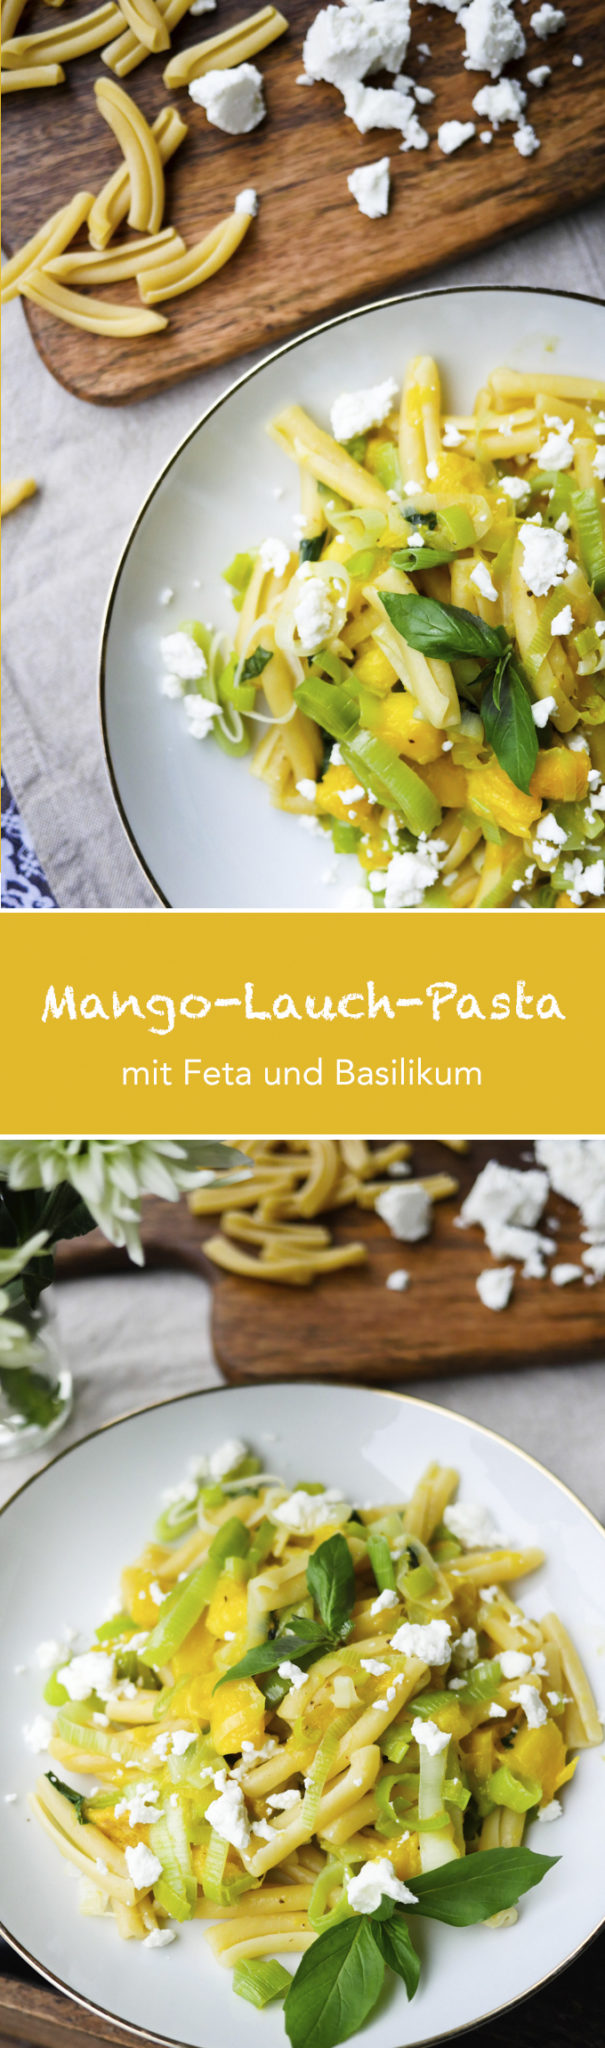 Leckere Mango-Lauch-Pasta mit Feta und Basilikum